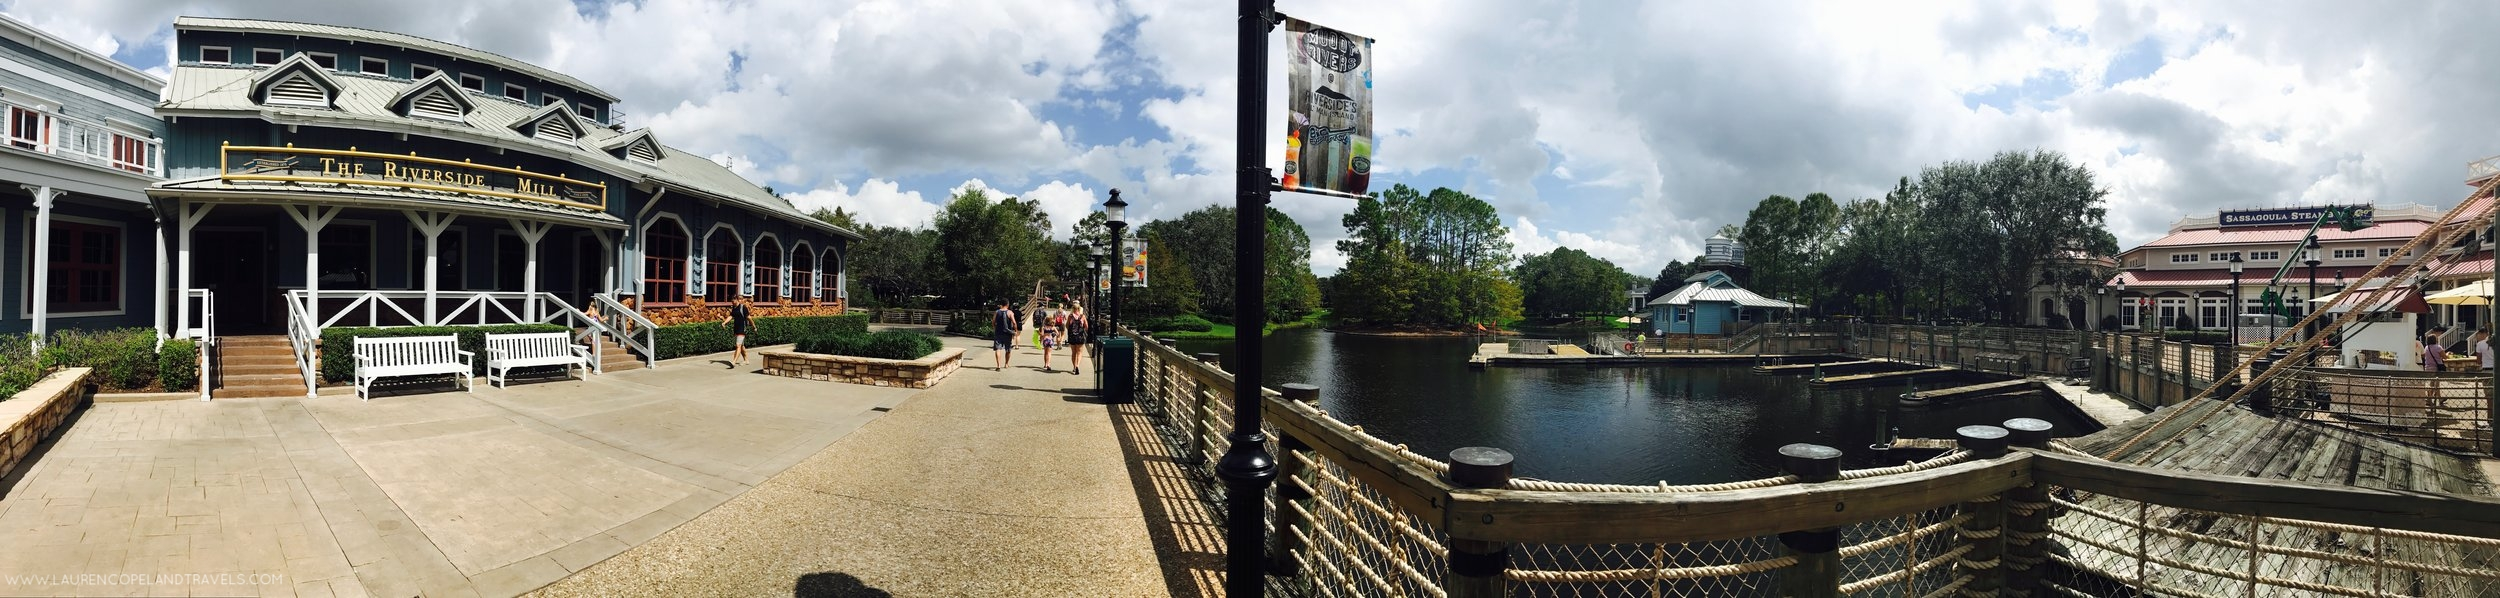 A glimpse of the surroundings inside Disney's Port Orleans: Riverside Resort